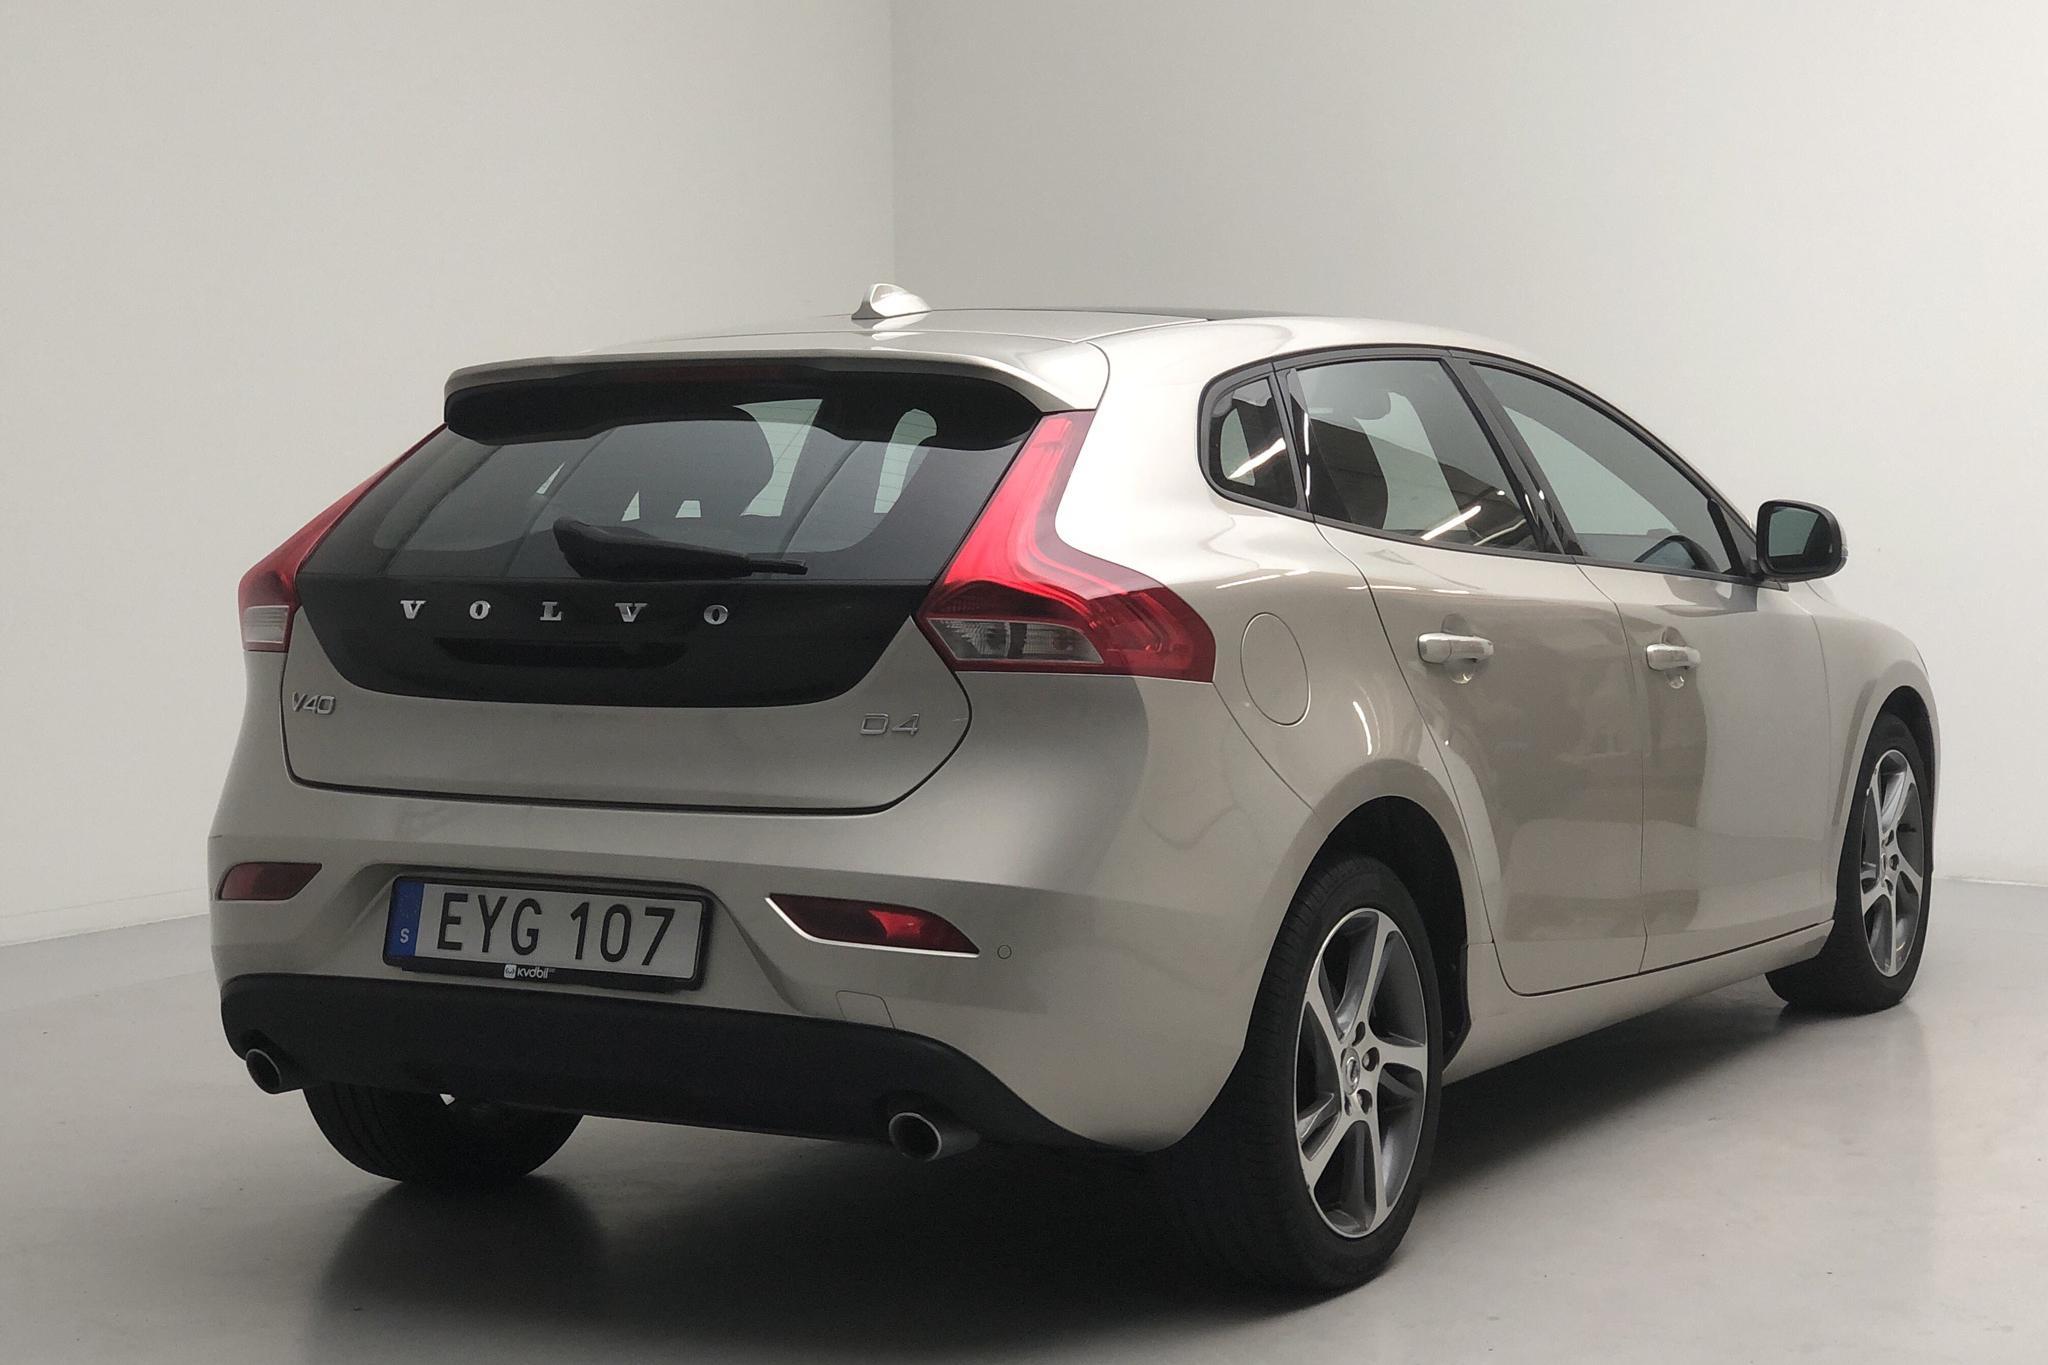 Volvo V40 D4 (190hk) - 92 130 km - Automatic - Light Brown - 2017